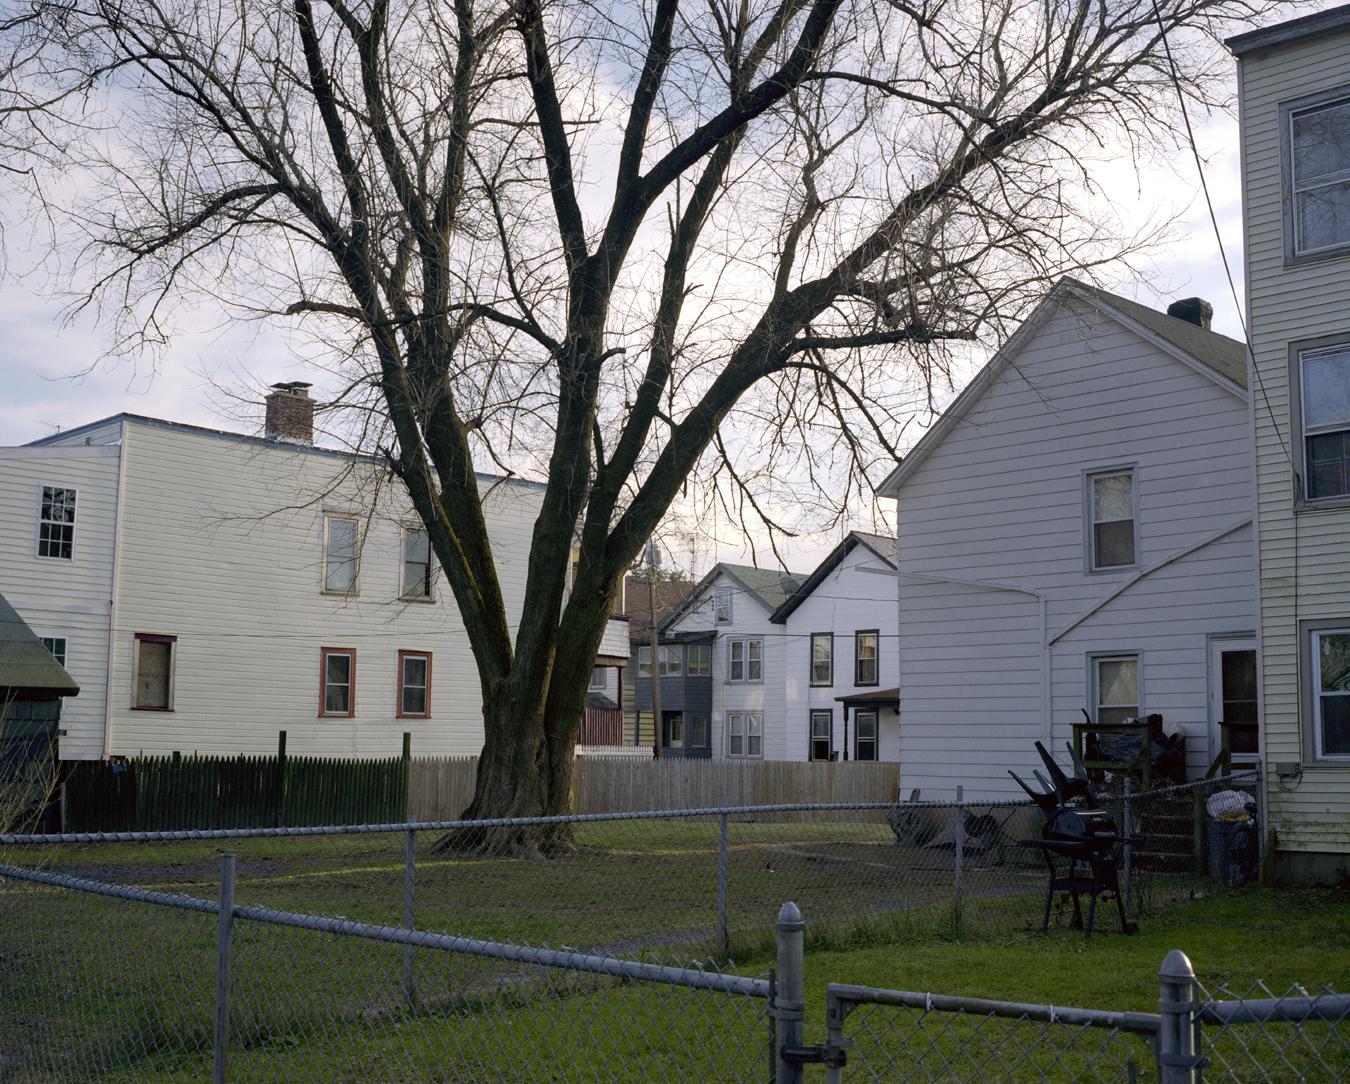 StrawberryAlley.Backyard.Tree.2Small.jpg